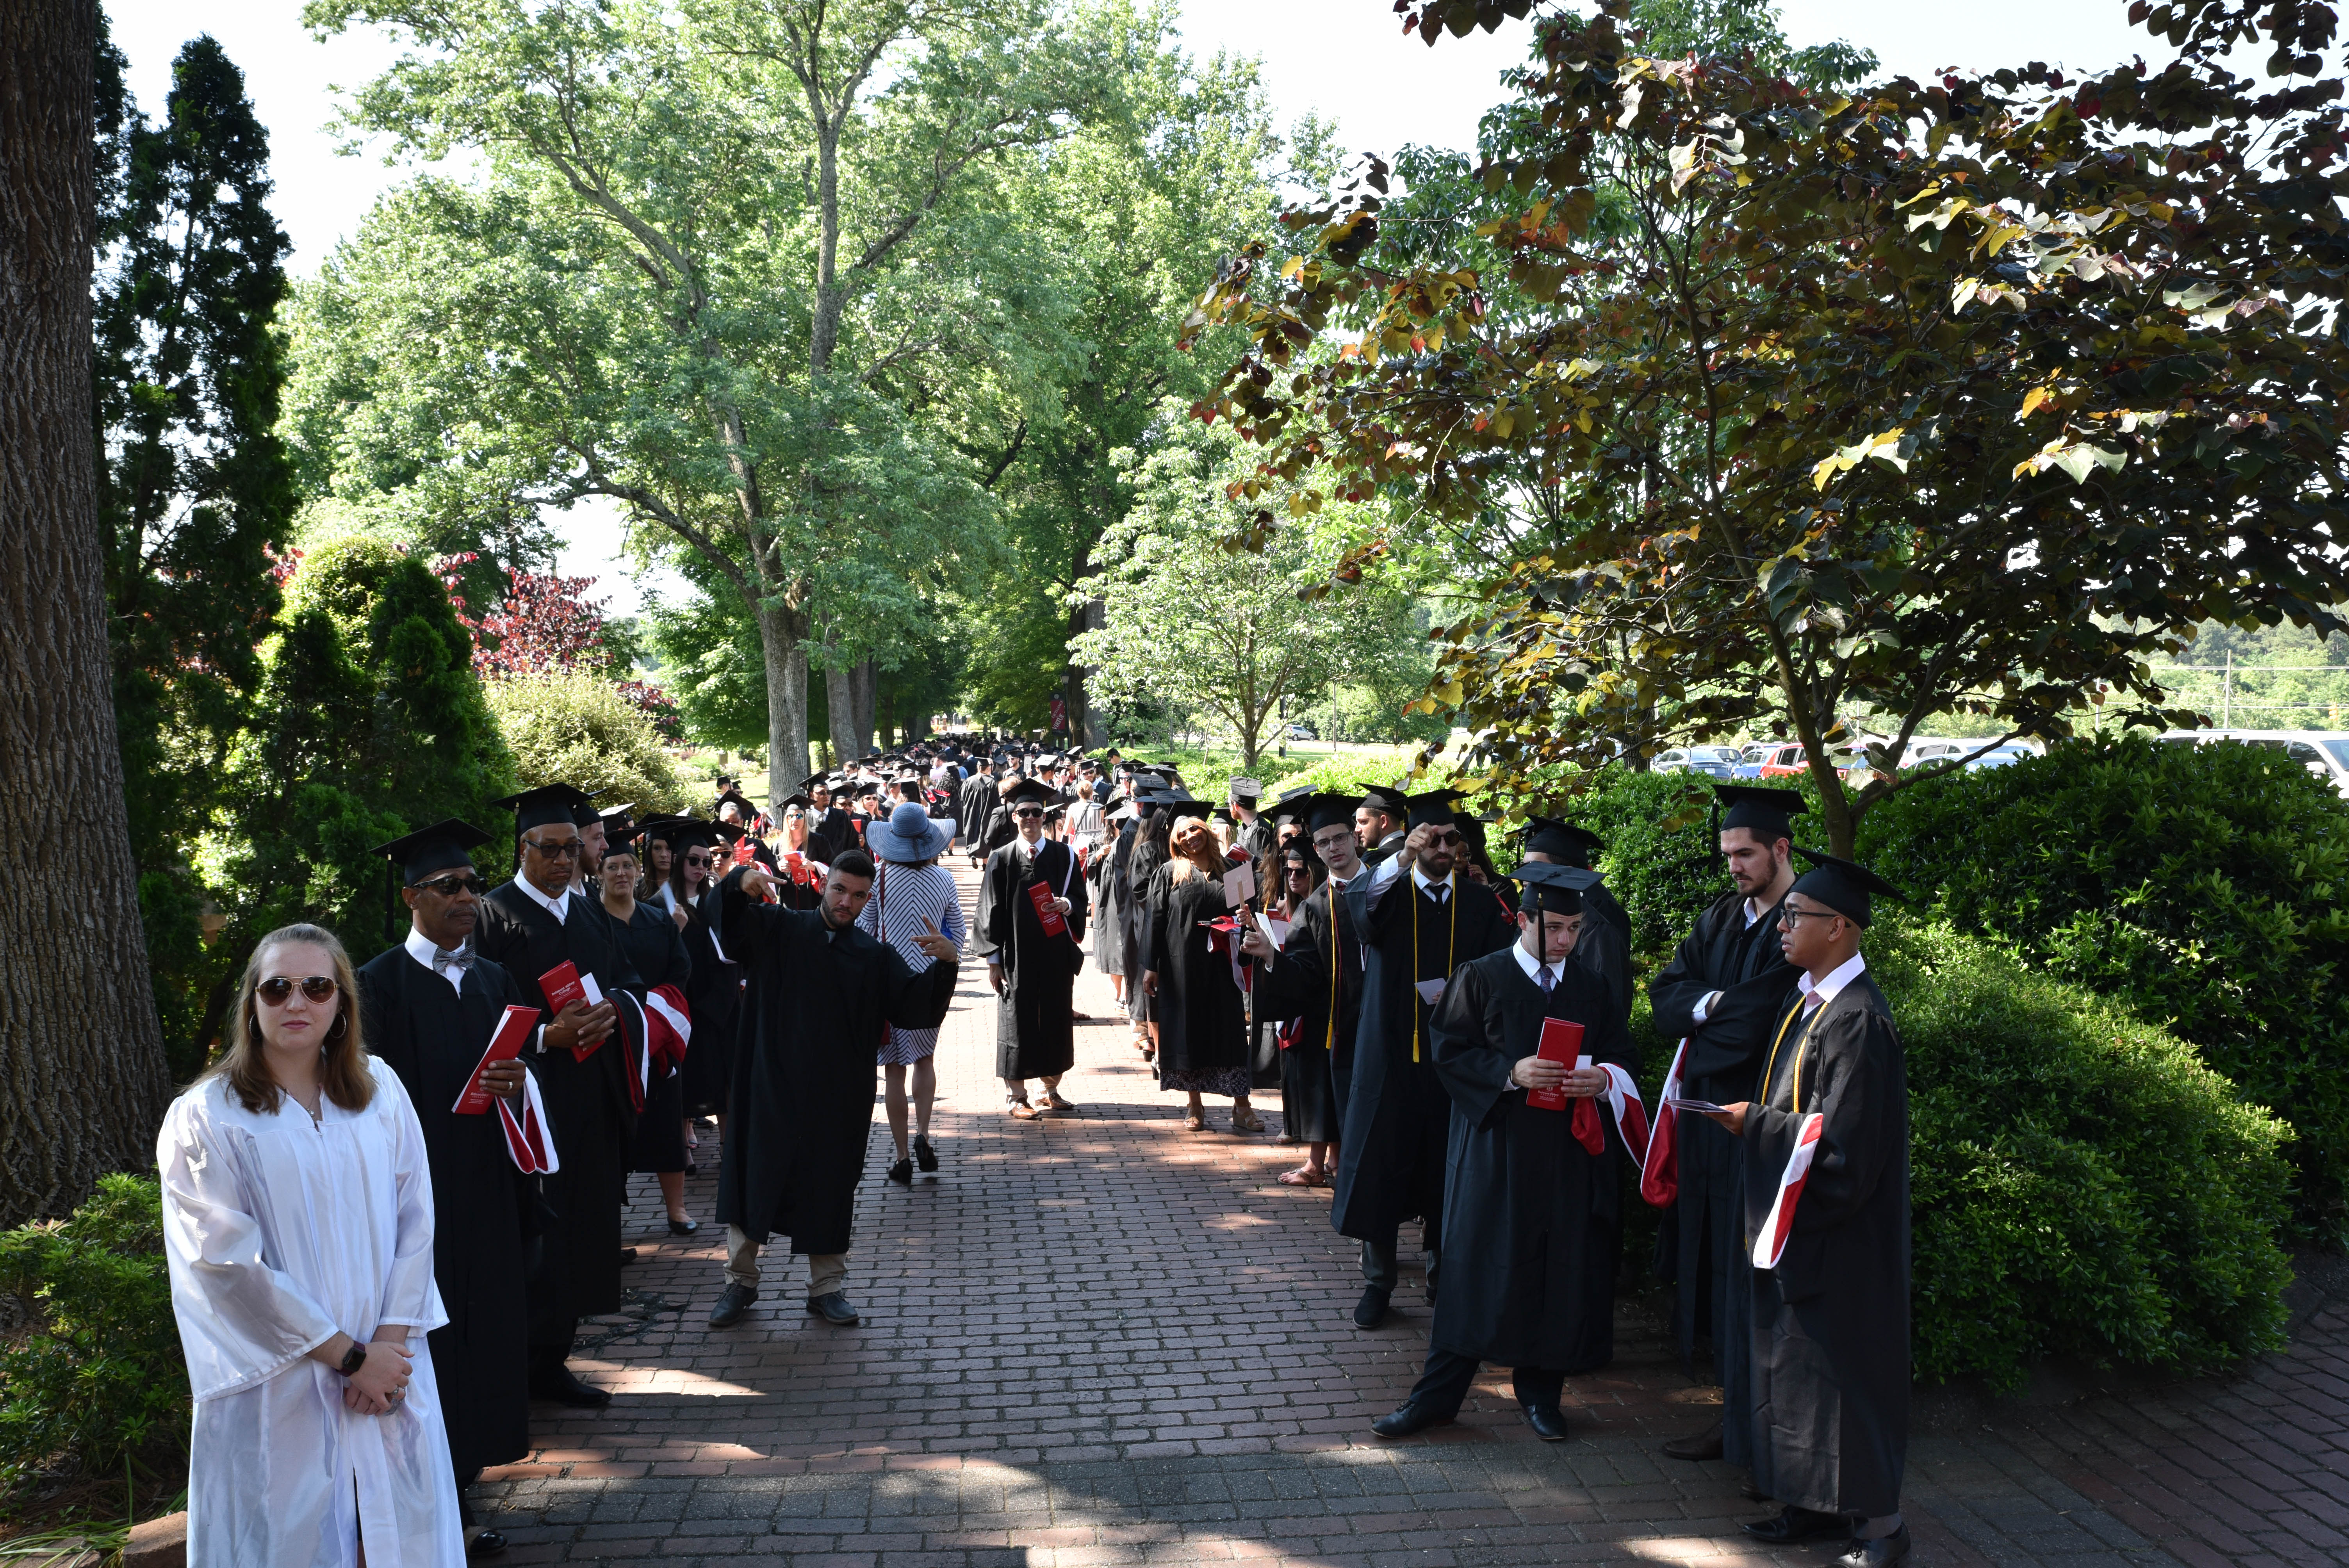 Graduation Procession, 2019